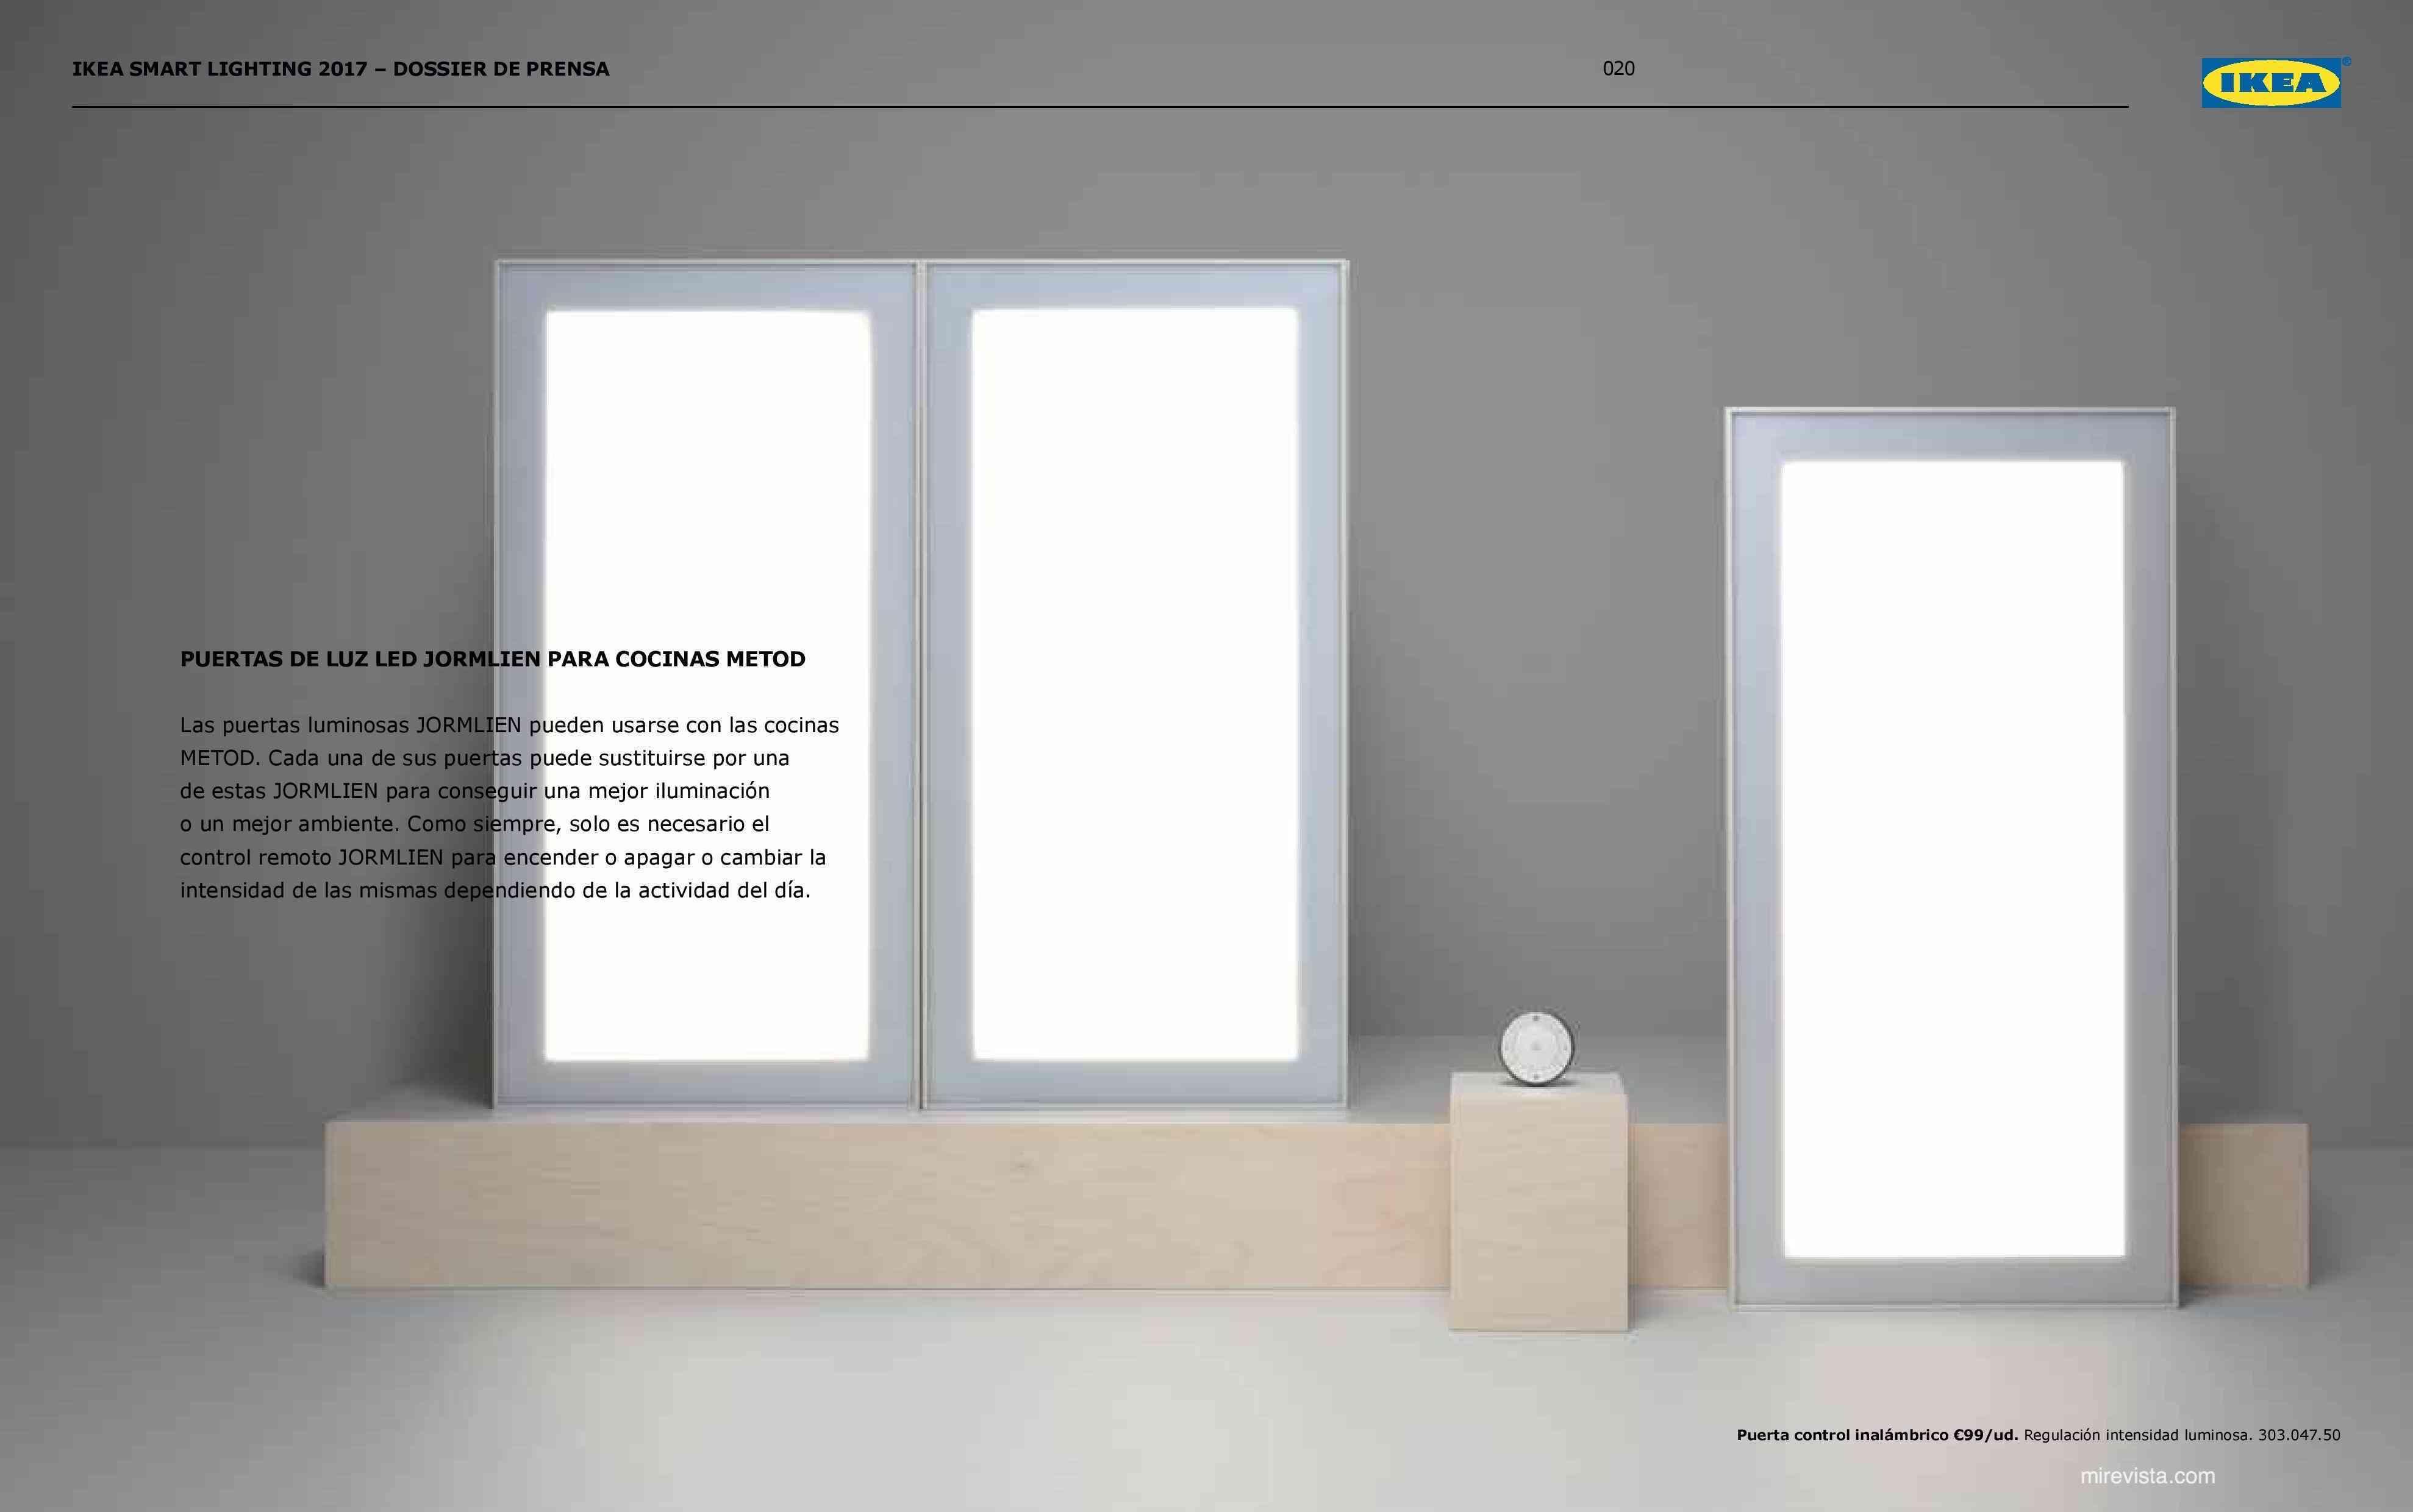 Novedades en iluminación de casas inteligentes con IKEA 76